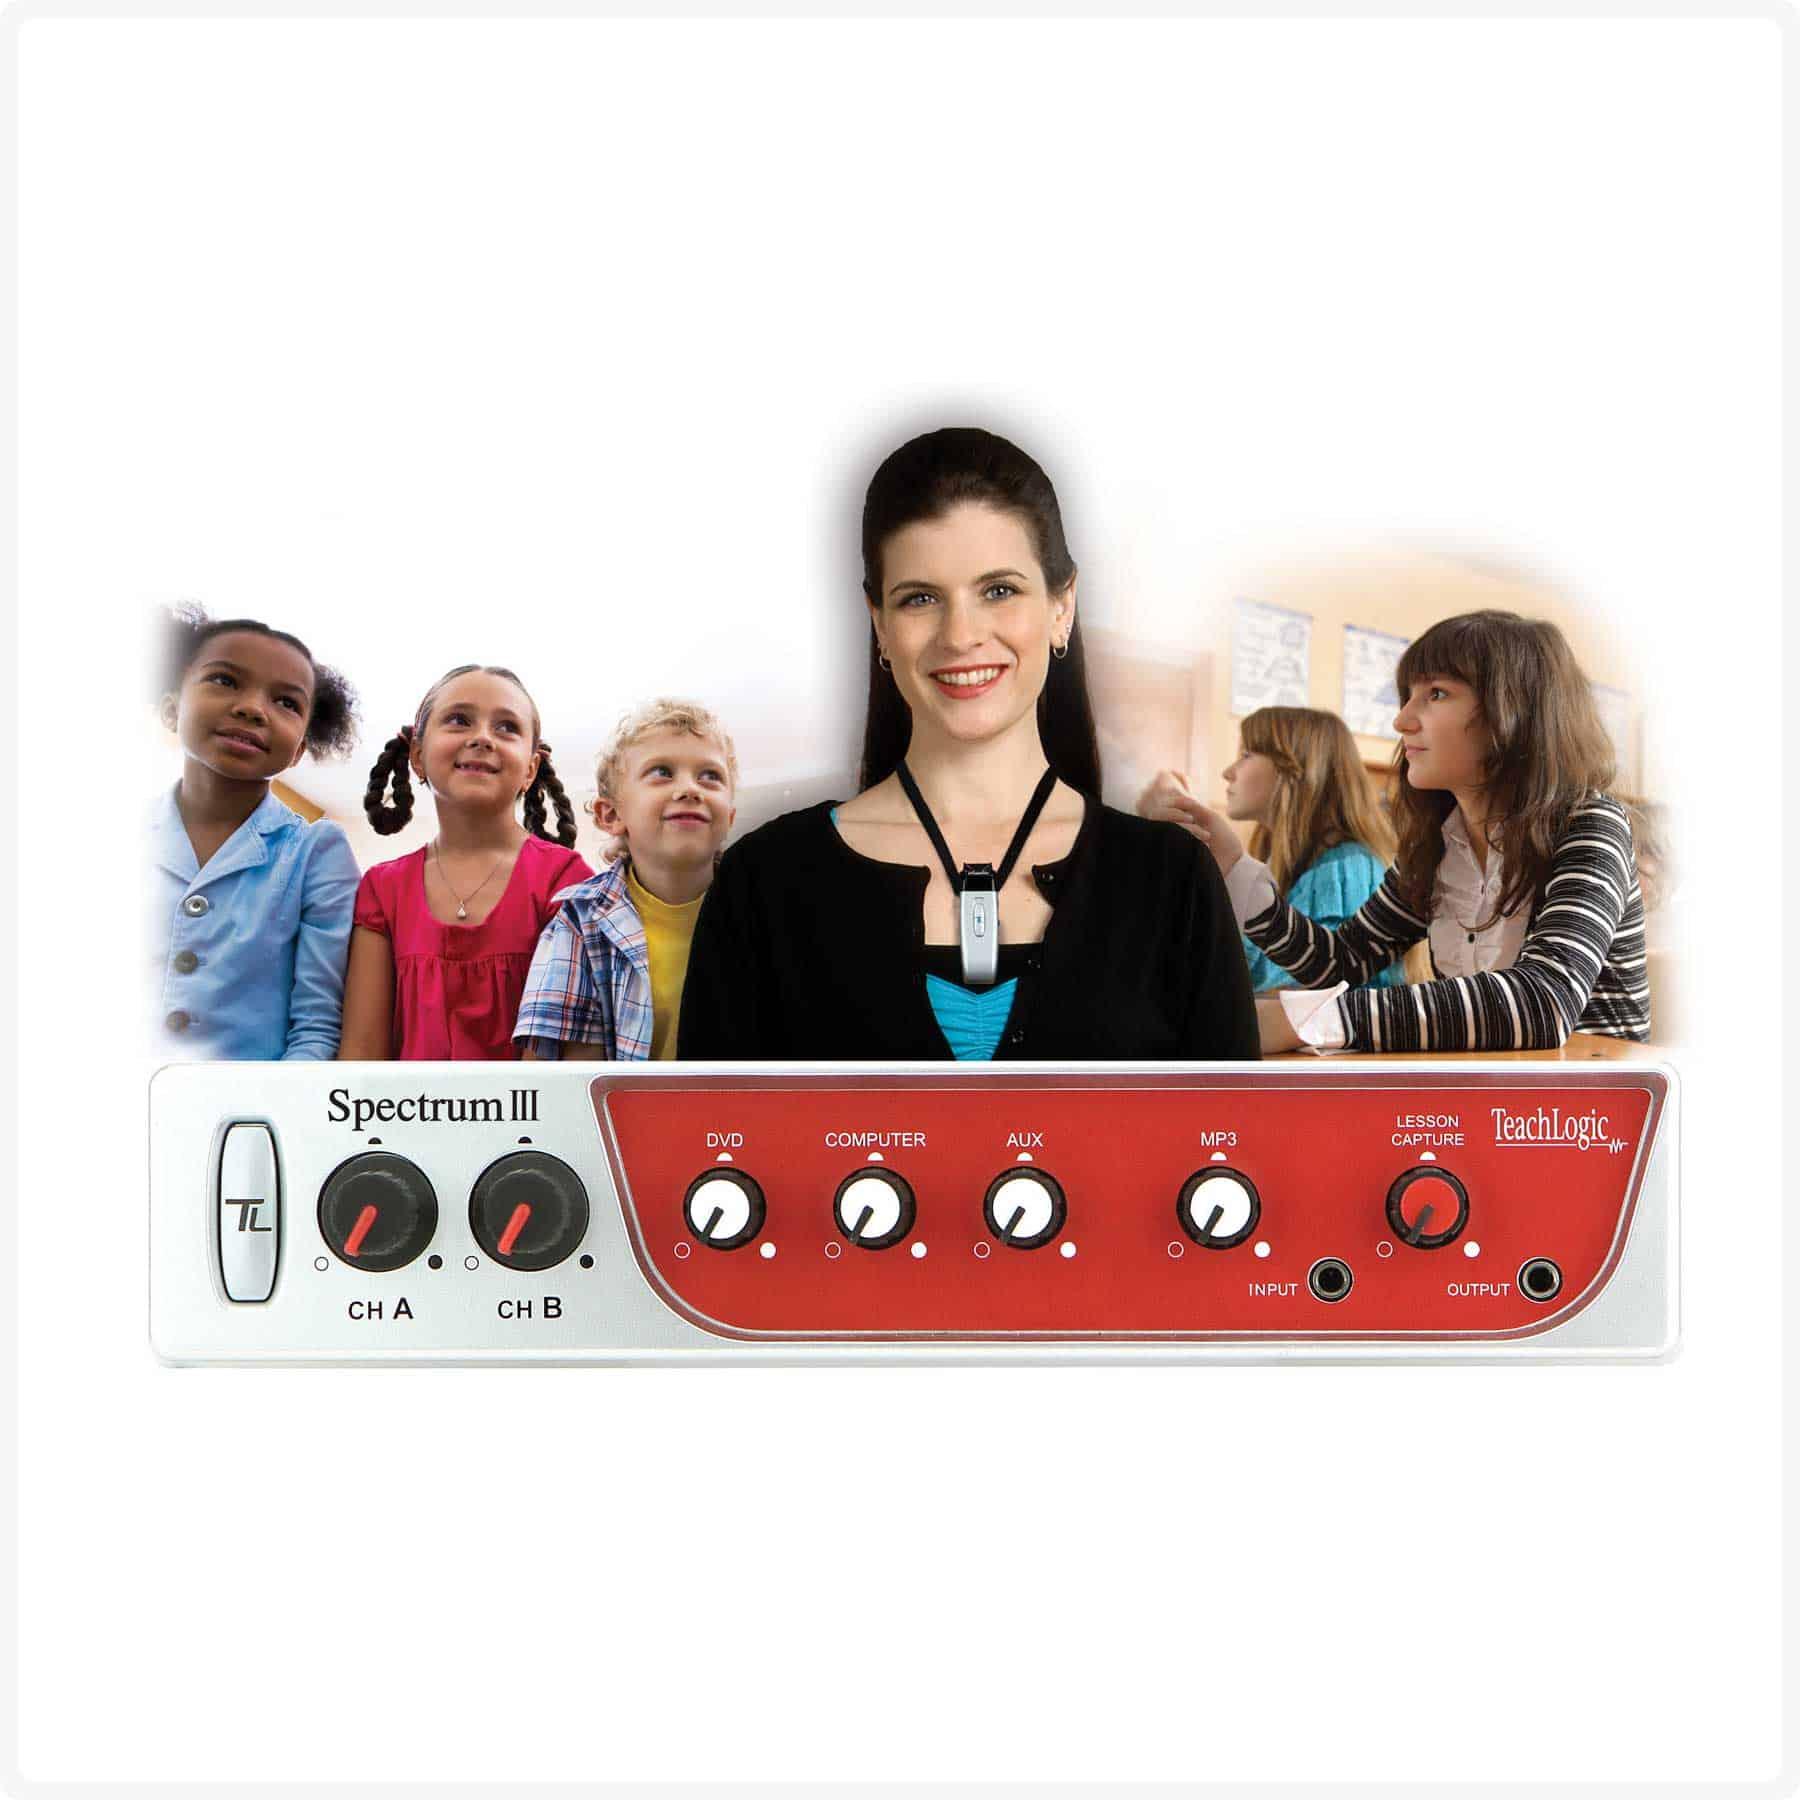 Spectrum Iii Teachlogic Classroom Microphone System Circuit Home Audio Systems